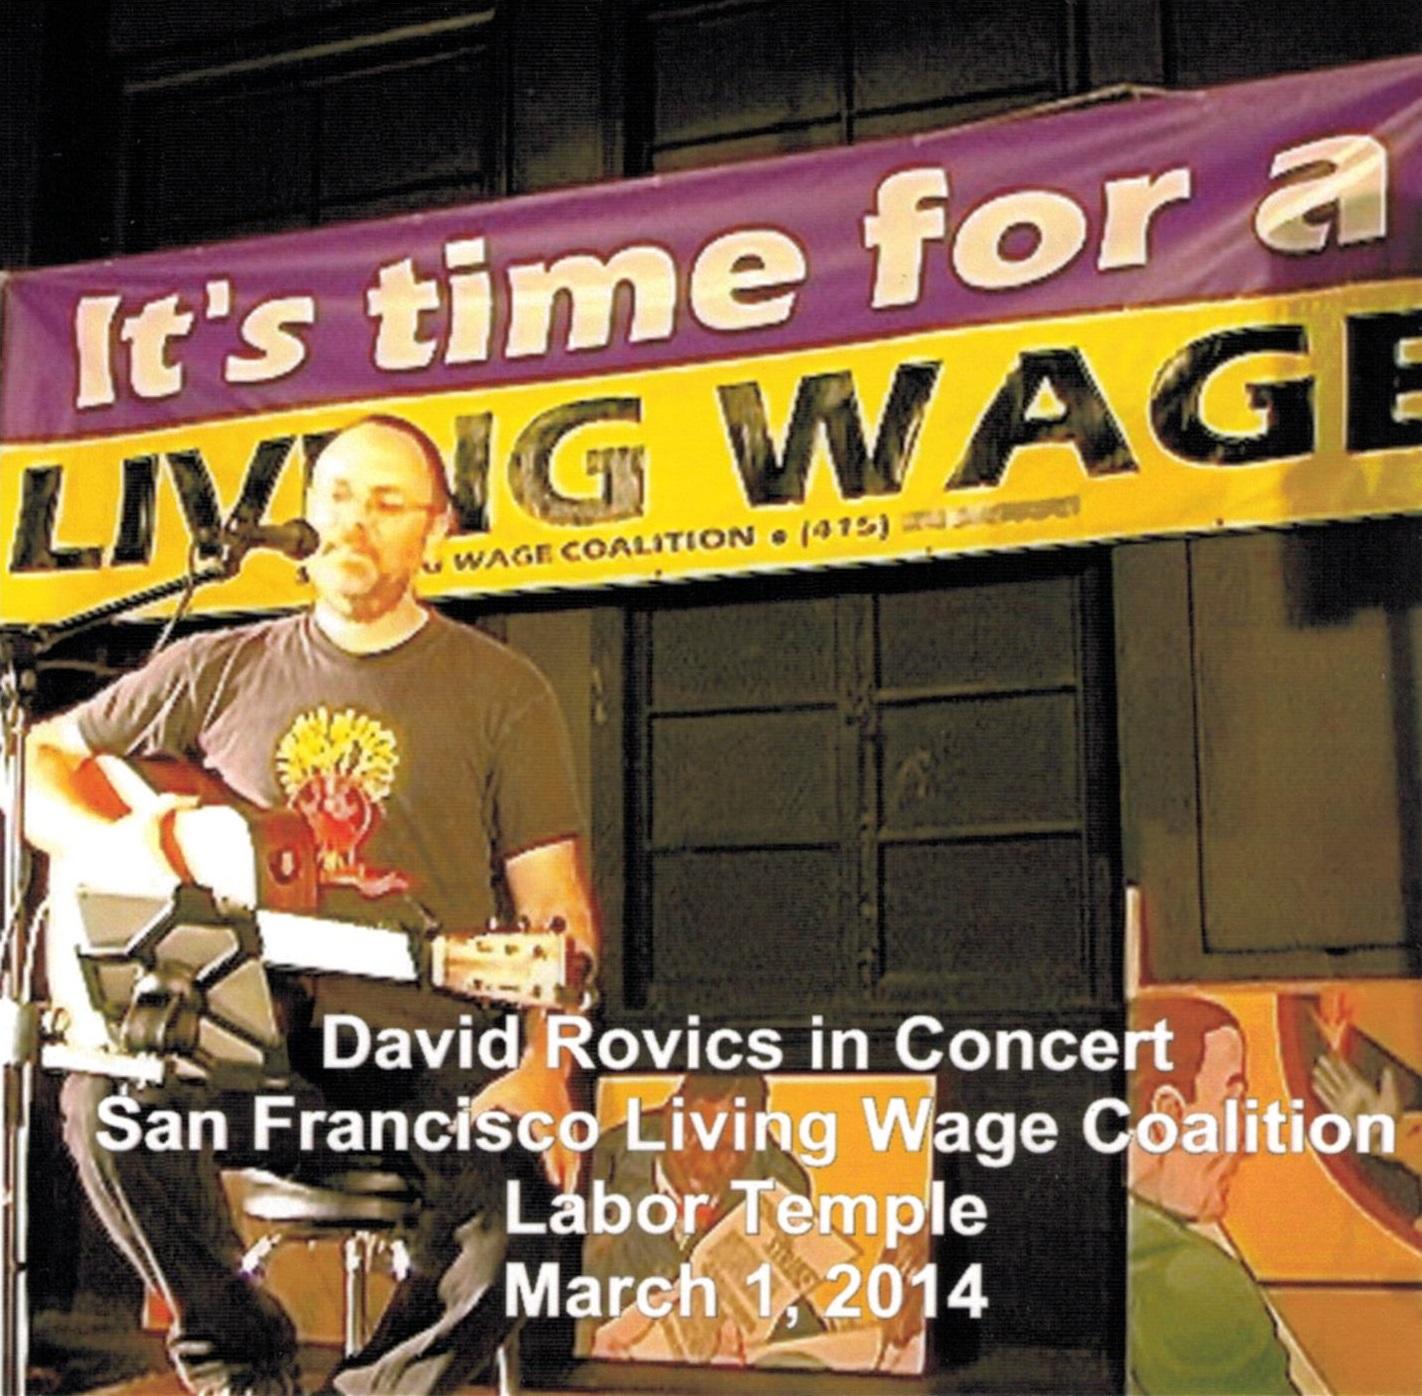 David Rovics in Concert